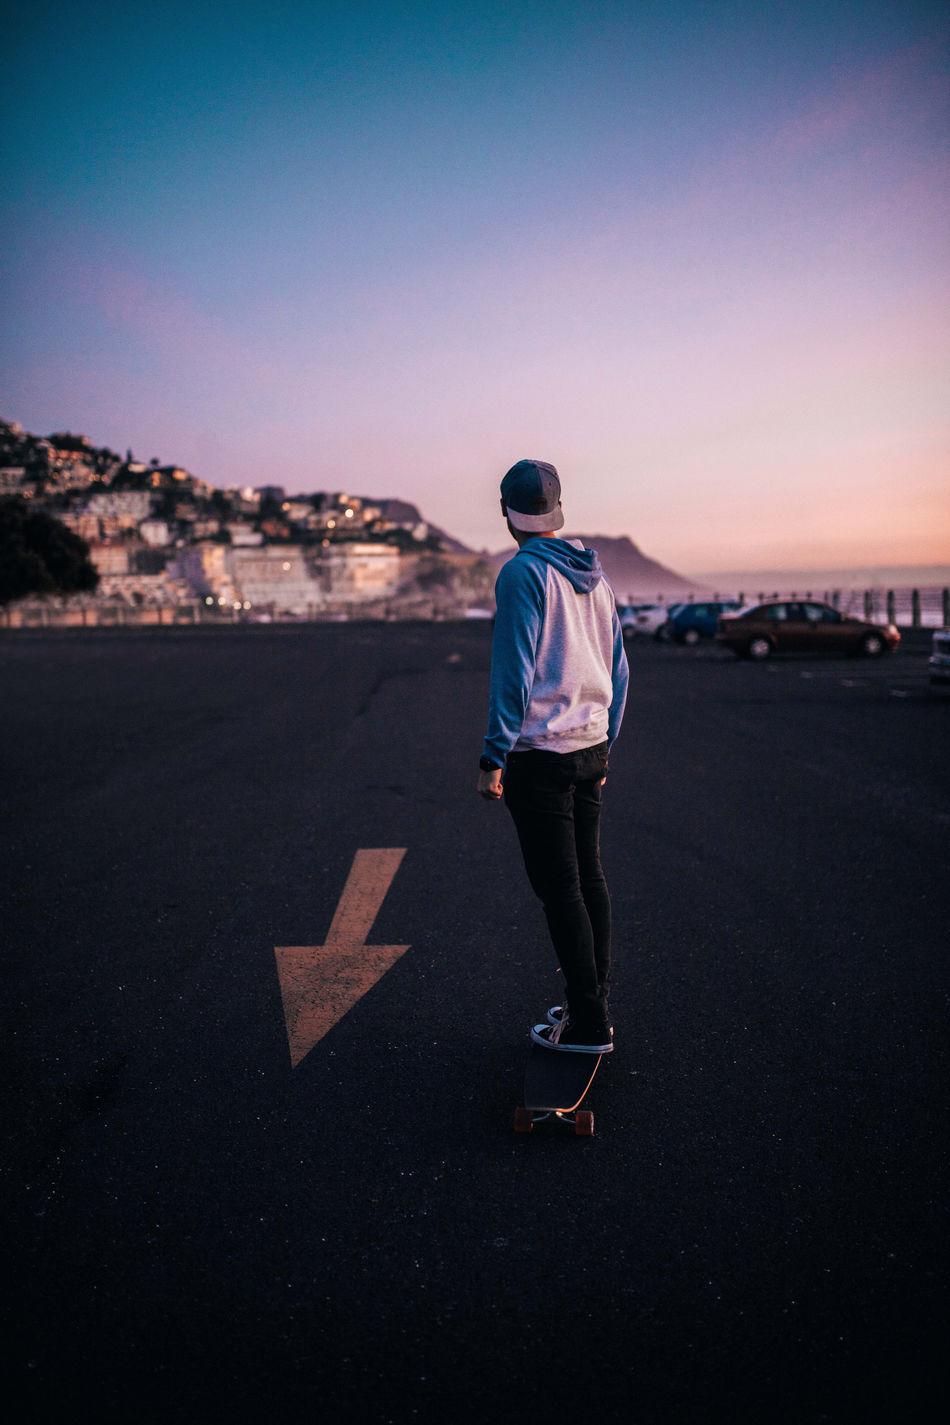 Cape Town crusin' Longboard Longboarding Man Parking Lot Real People Rolling Skateboarding Skating Sunset Urban